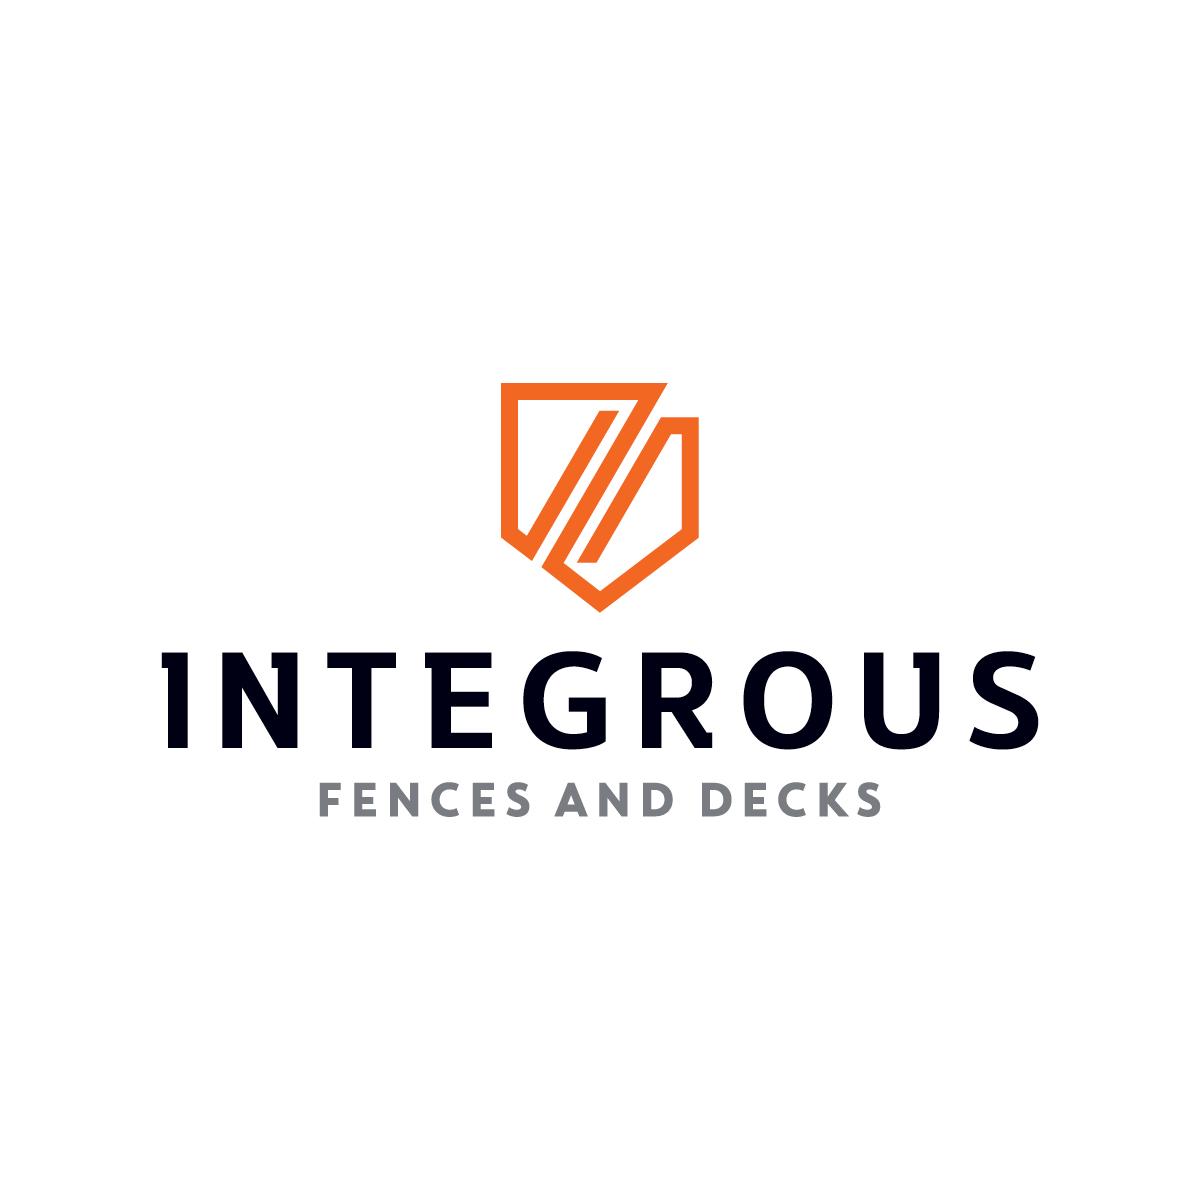 Integrous